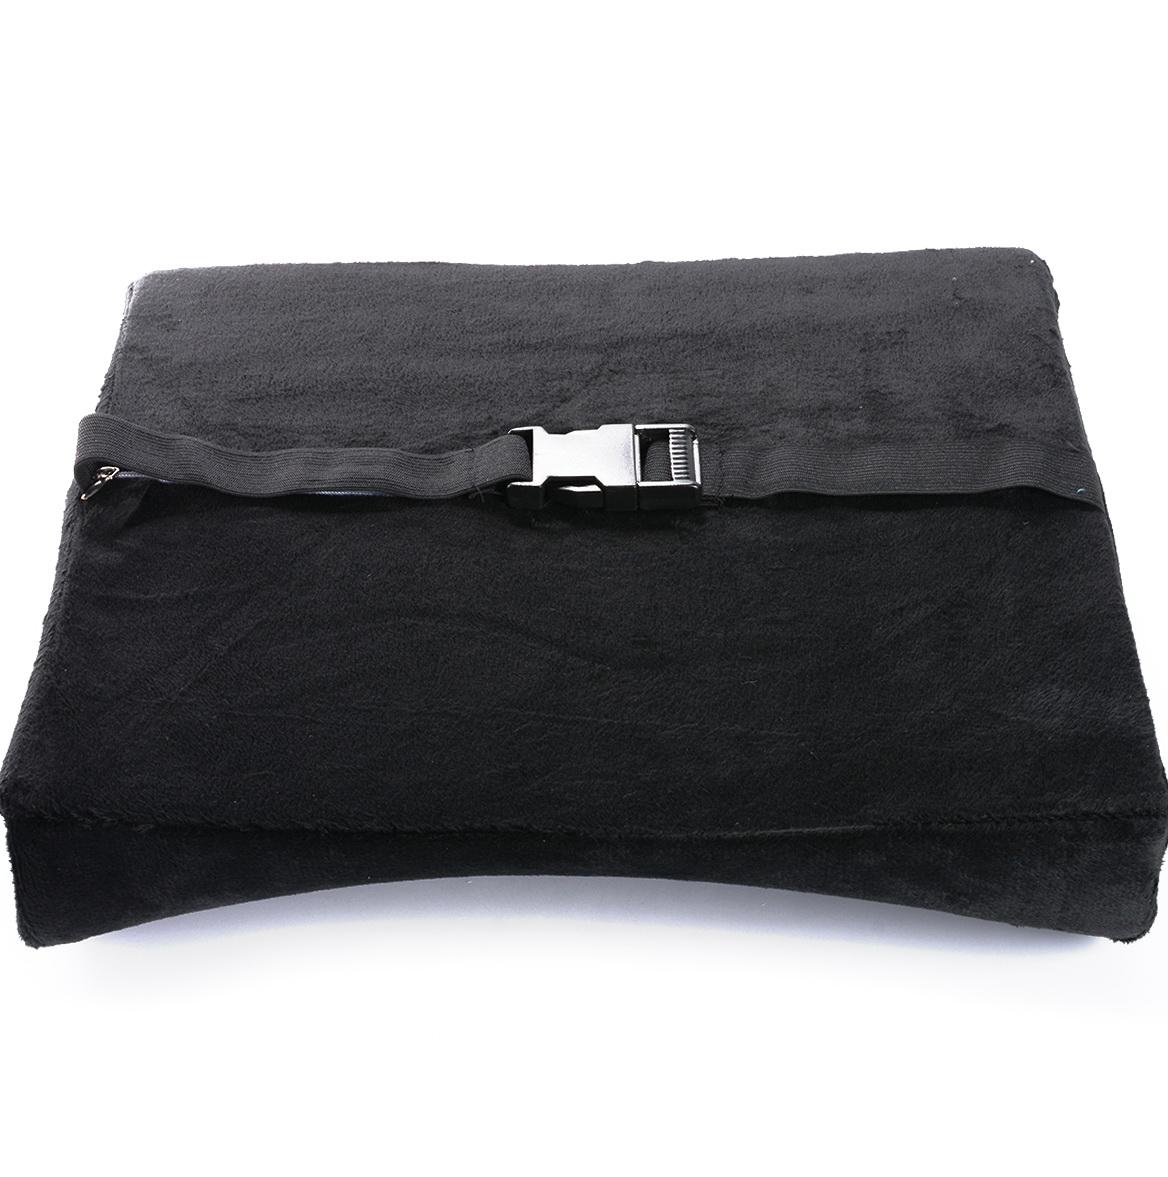 Office Chair Cushions For Leg Pain